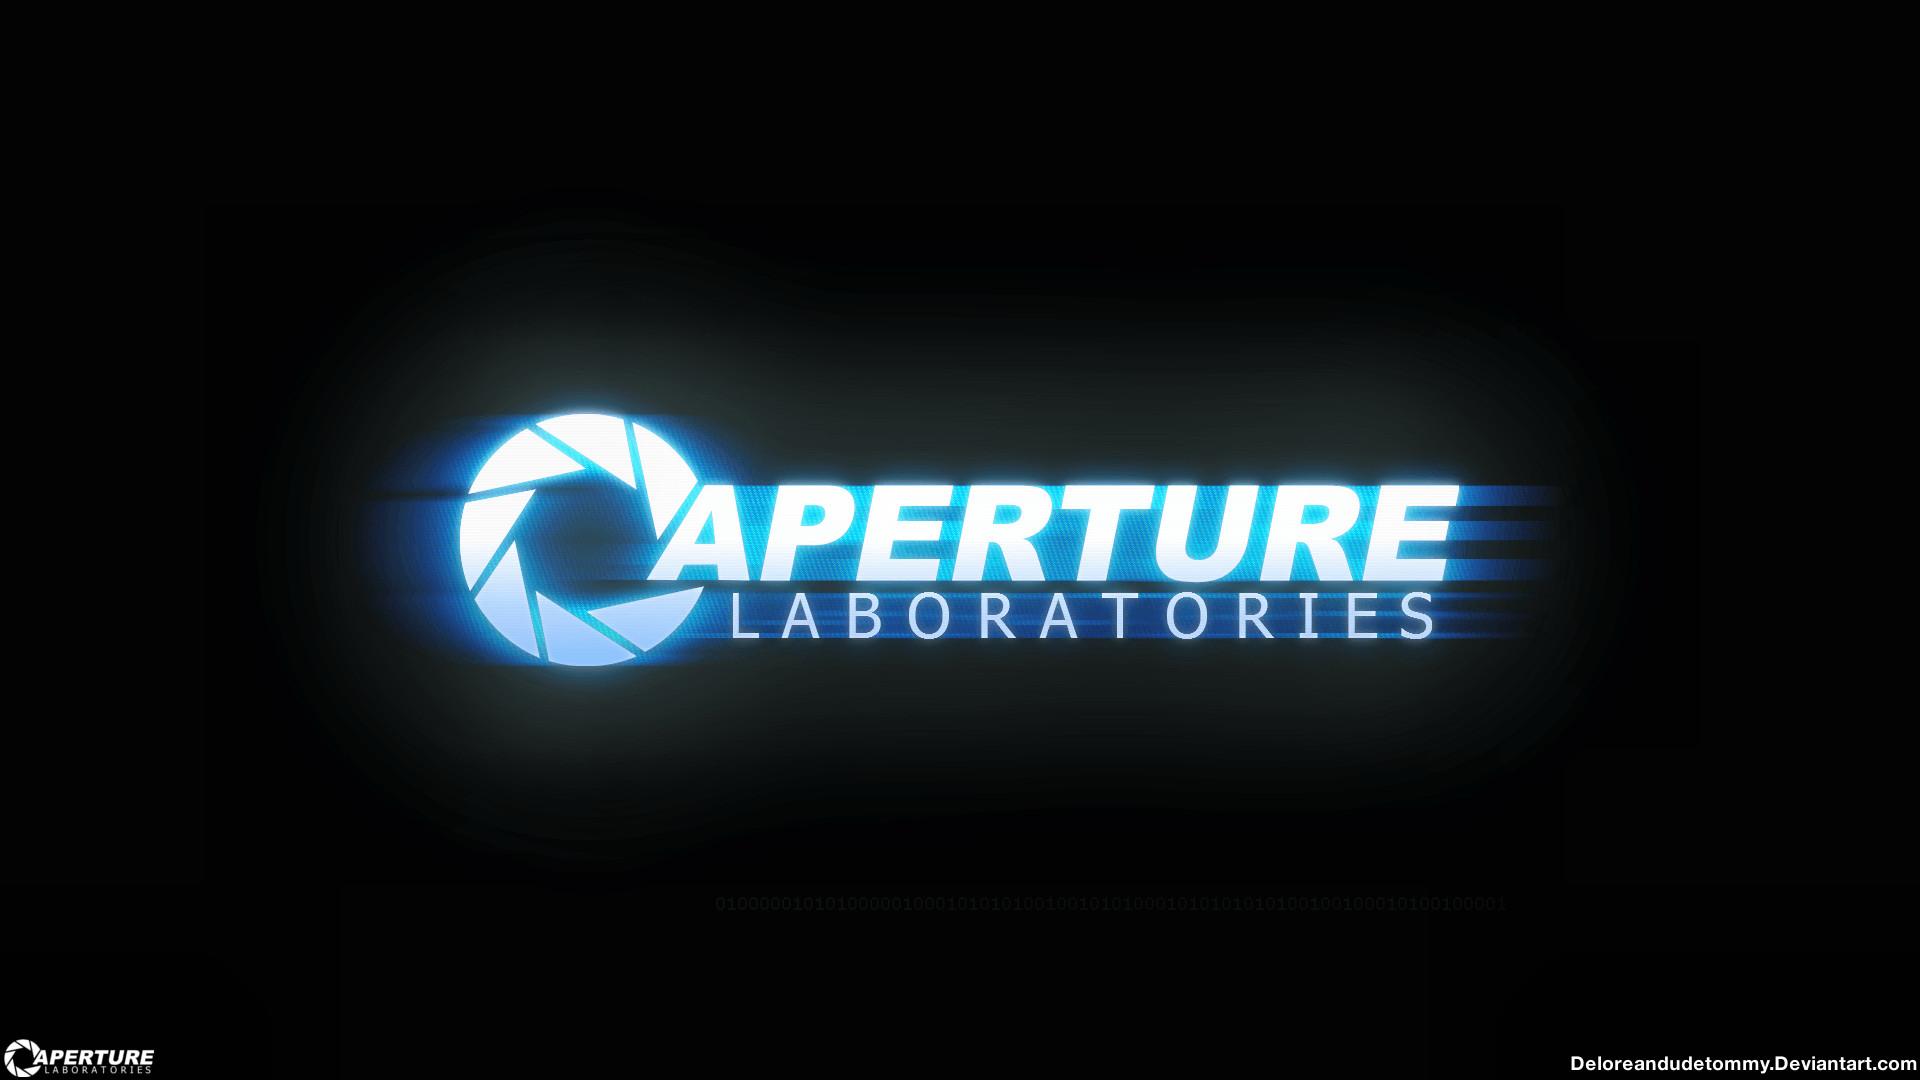 Aperture Science Wallpaper Hd Backgrounds 10 Cool Hd | Wallpaperiz.